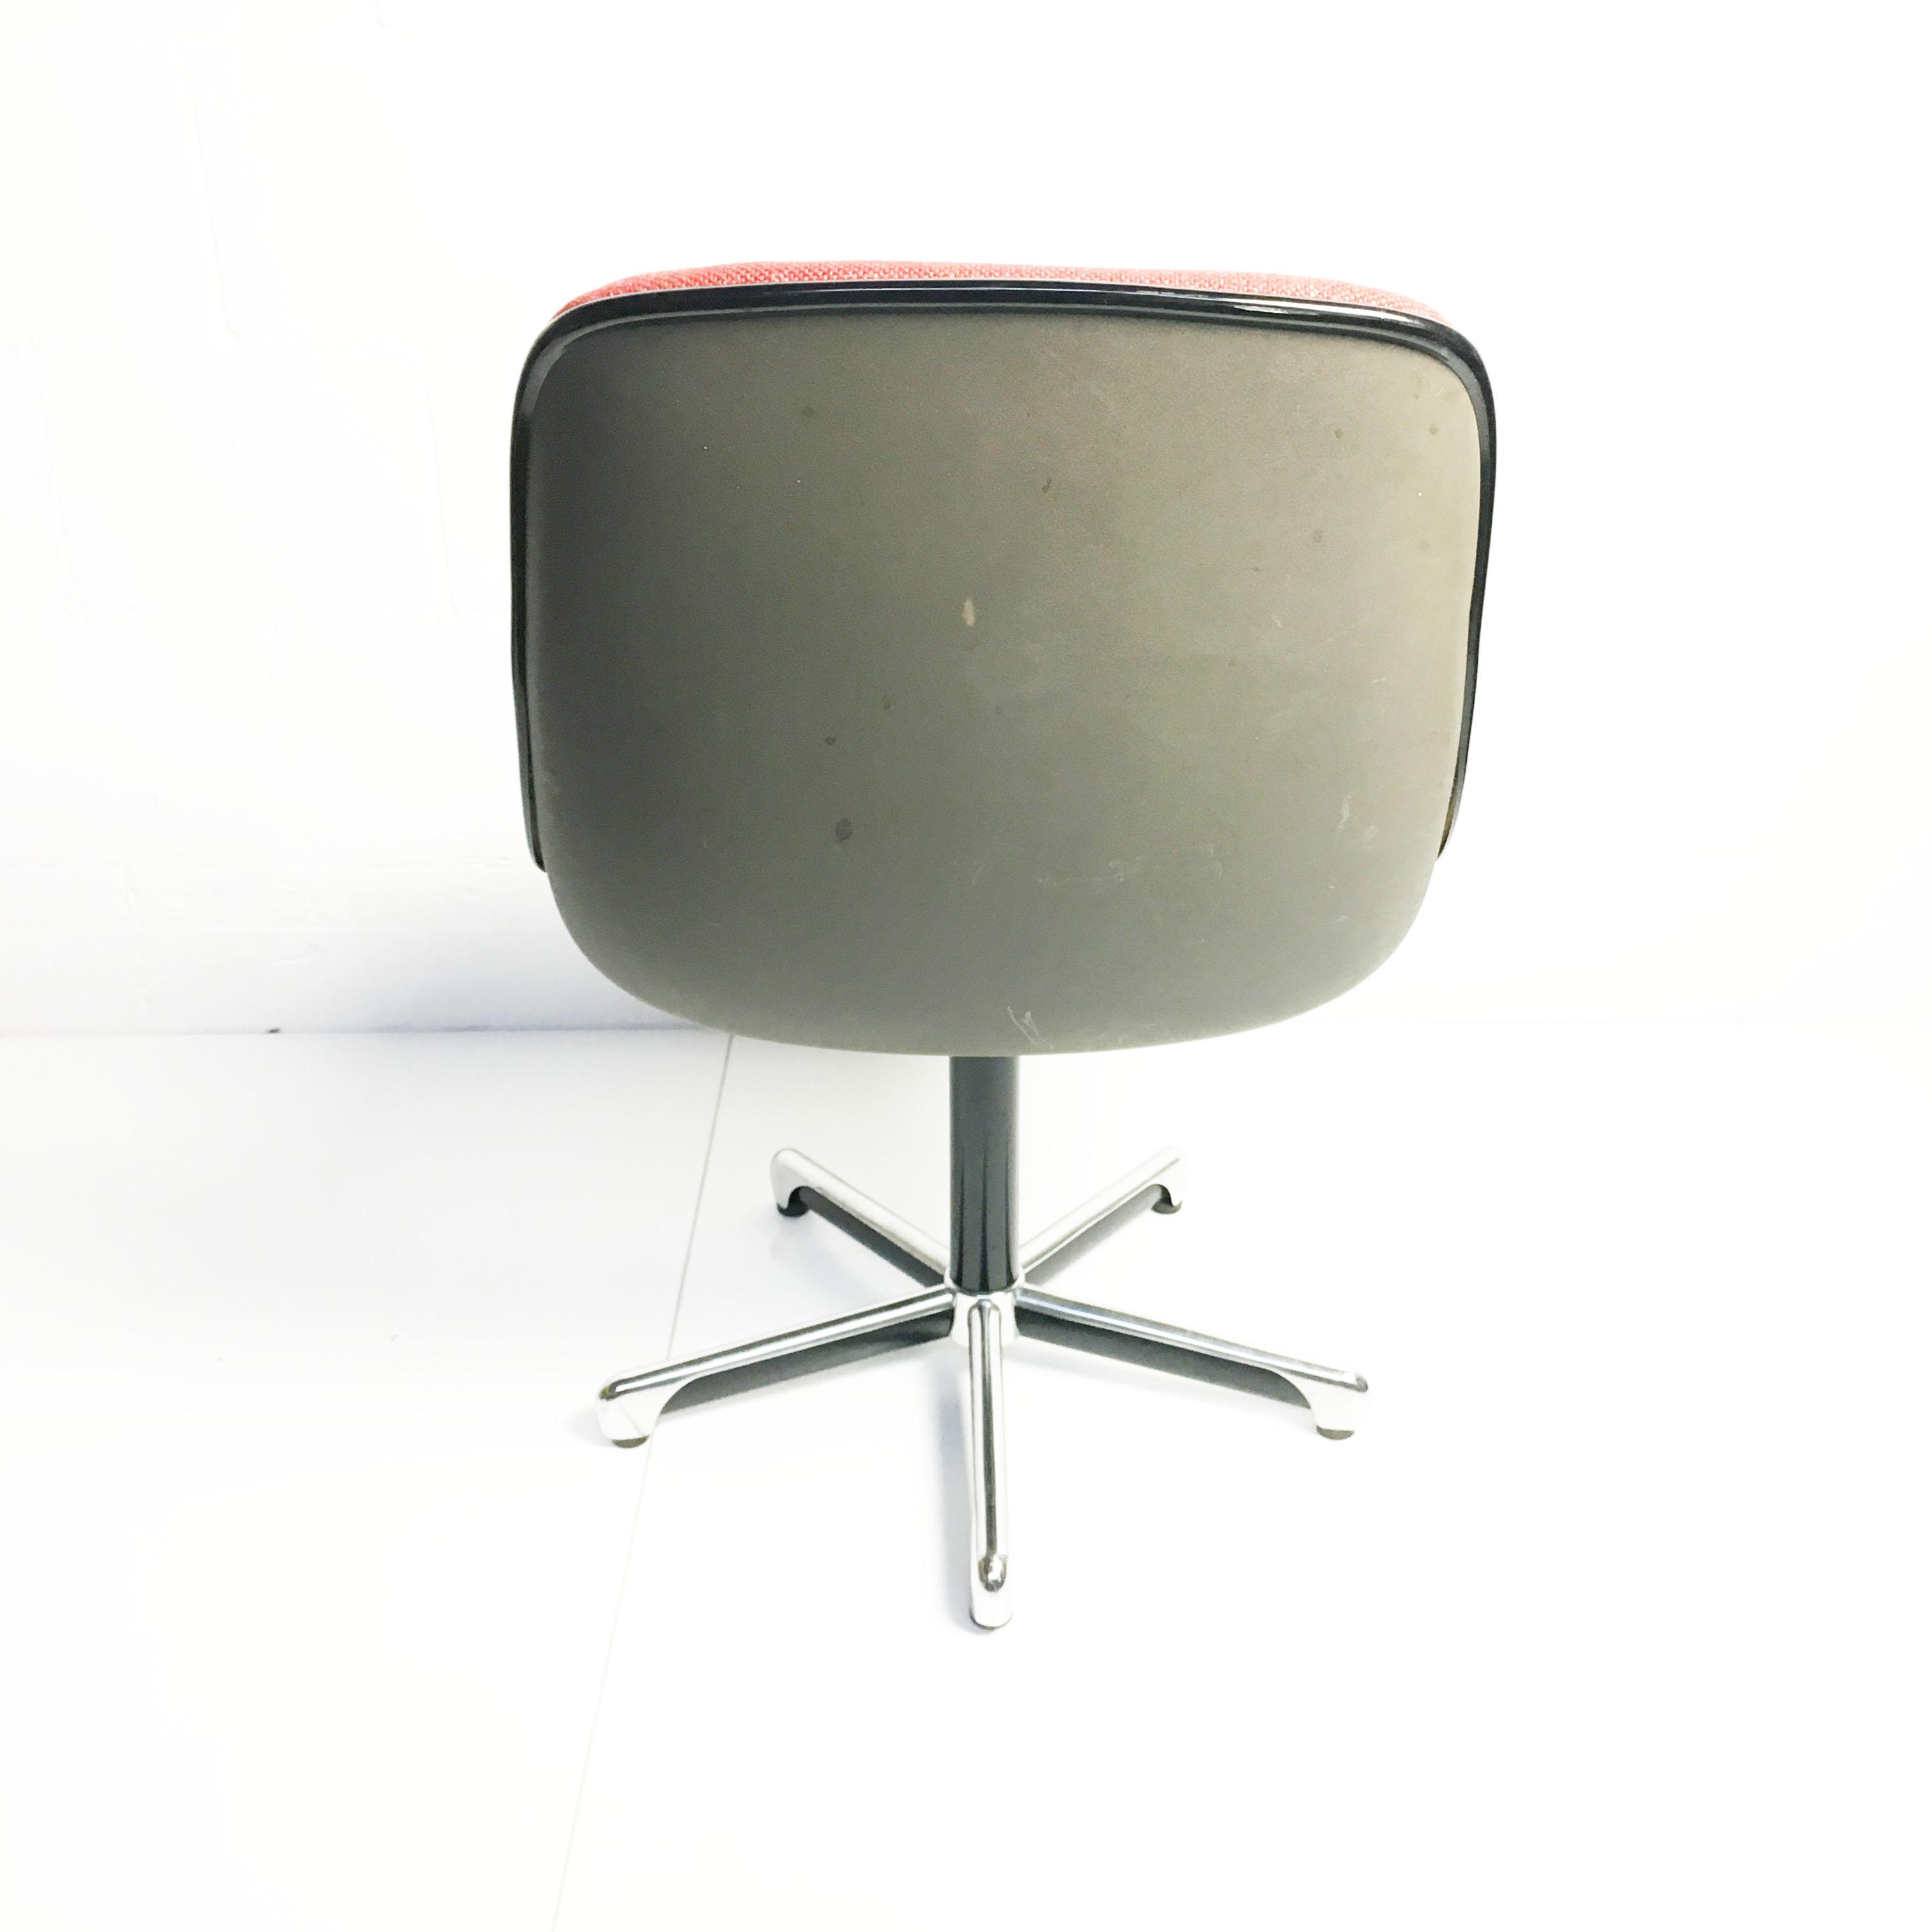 Walter Knoll Bureaustoel.Vintage Charlie Pollock Bureaustoel By Knoll 1963 Rood